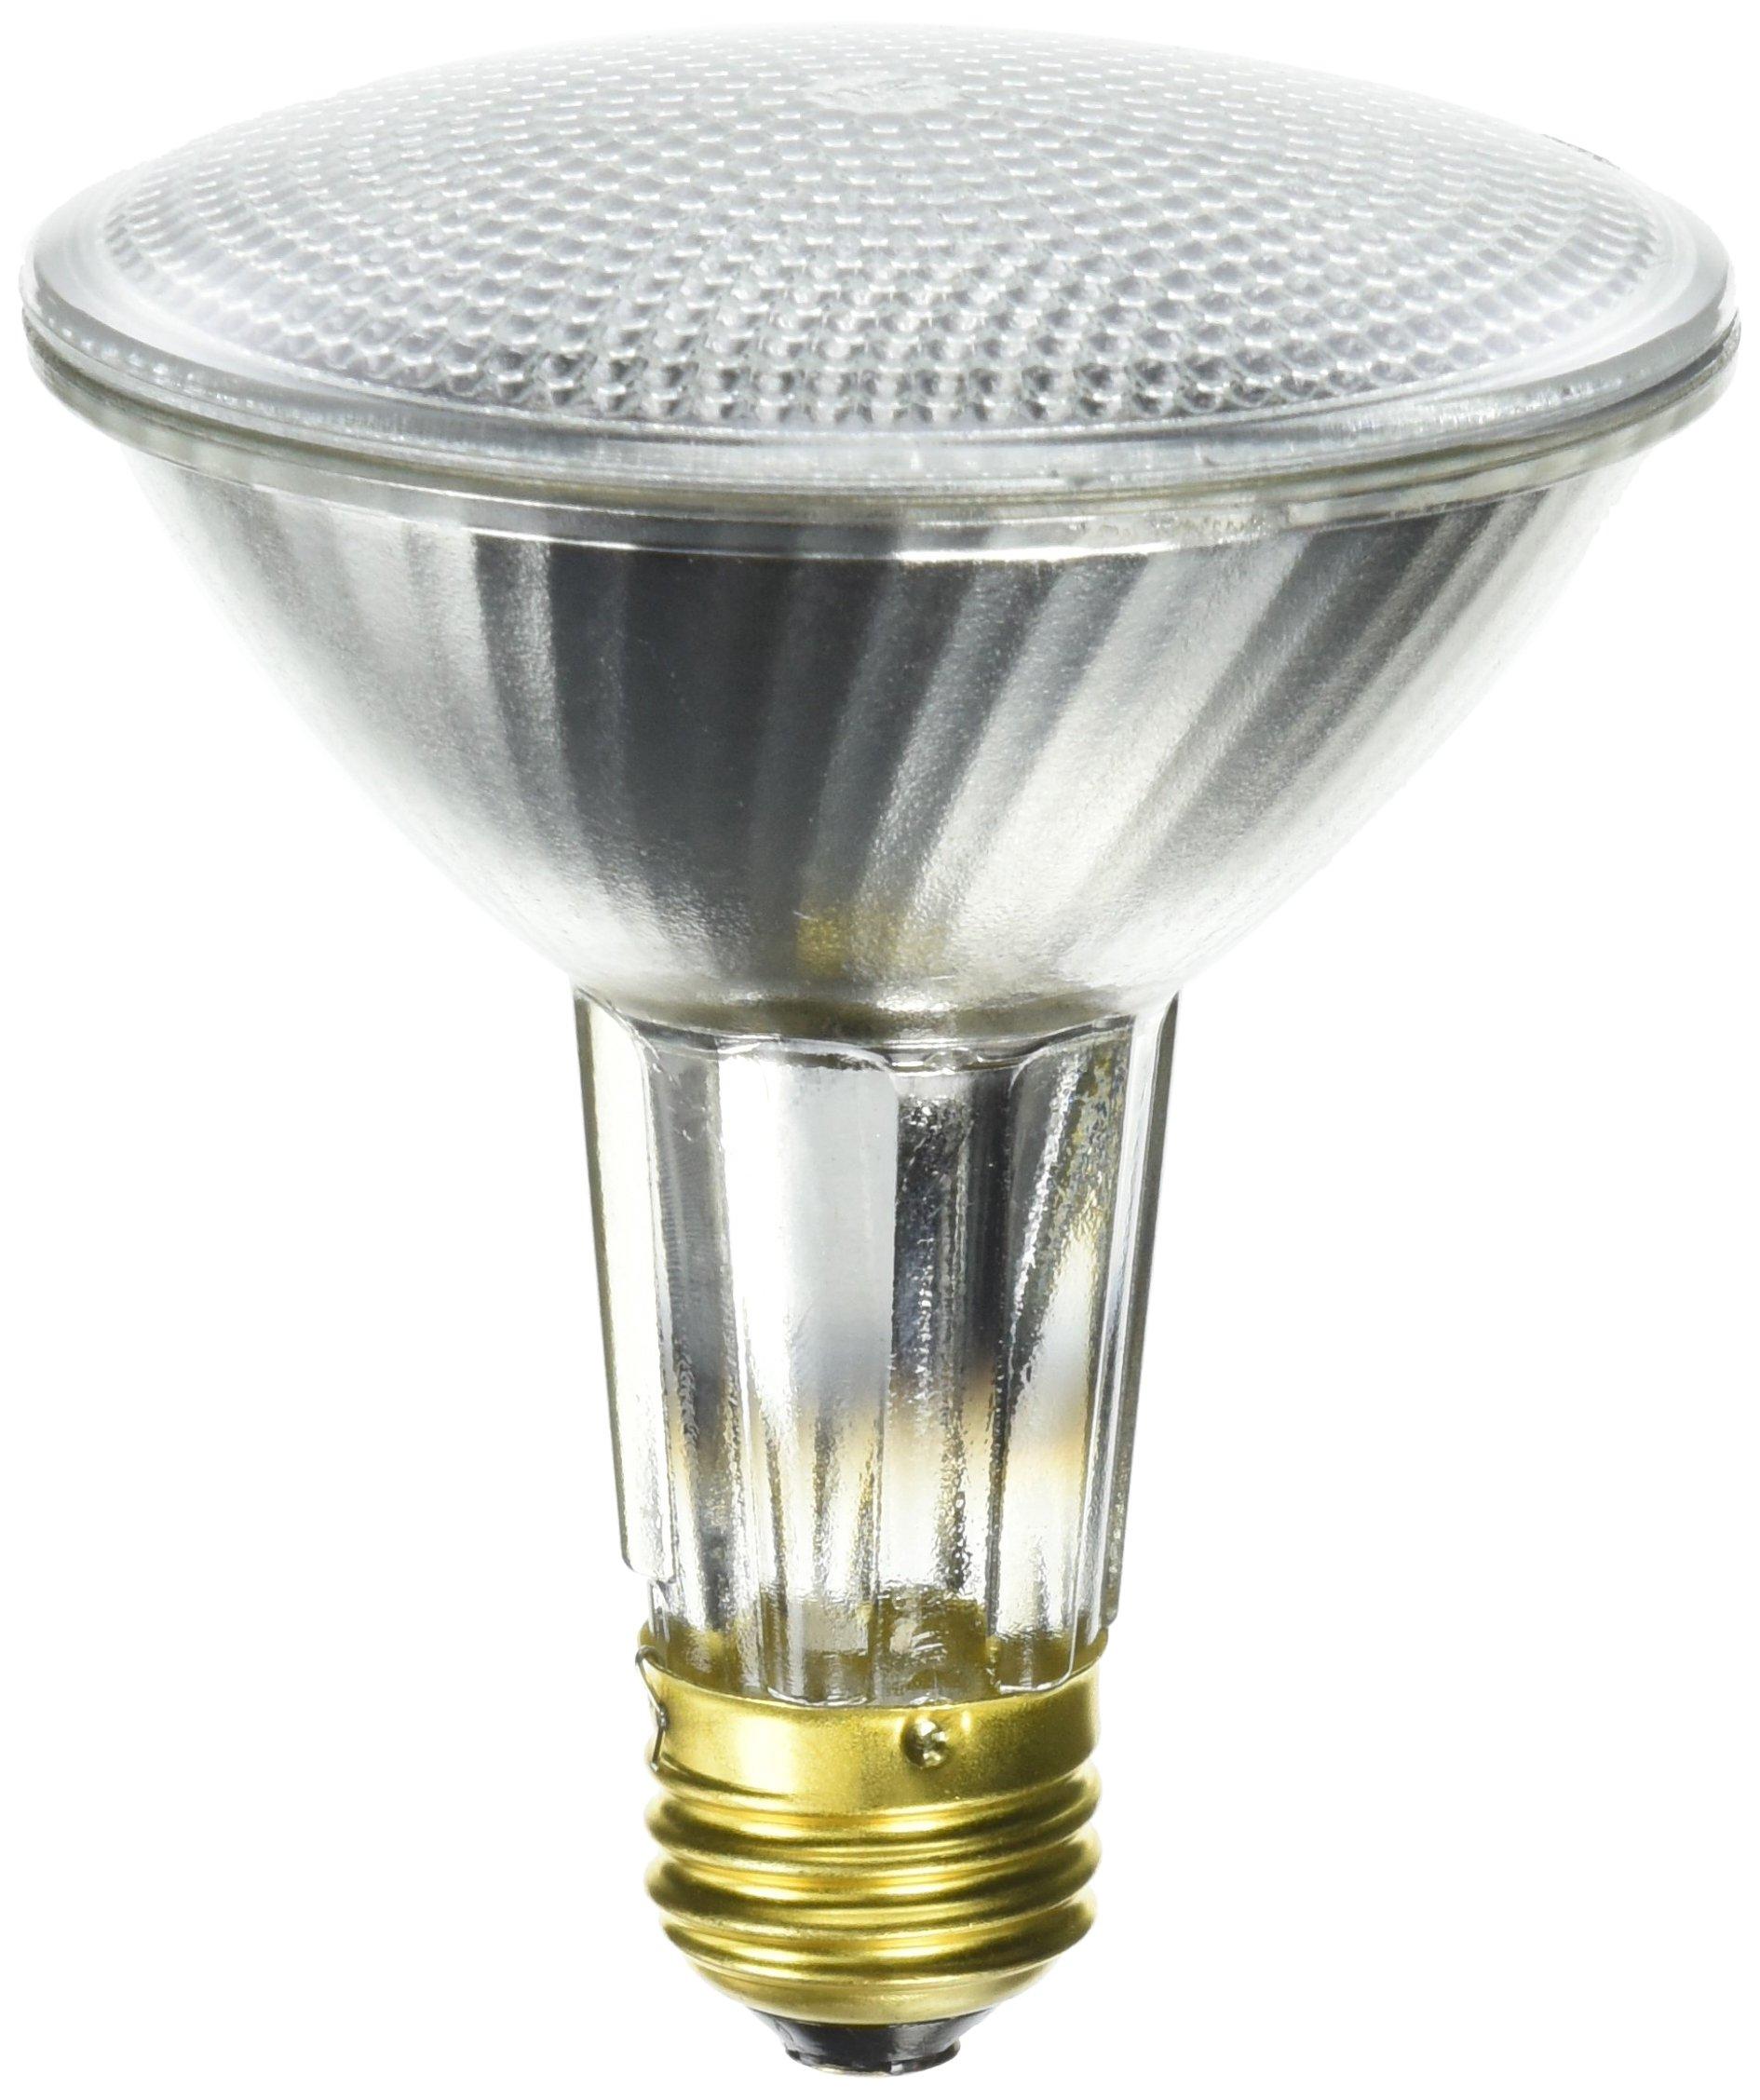 Sylvania 14823 75PAR30LN/HAL/WFL/RP 120V Long Neck Reflector Lamp, Pack of 6